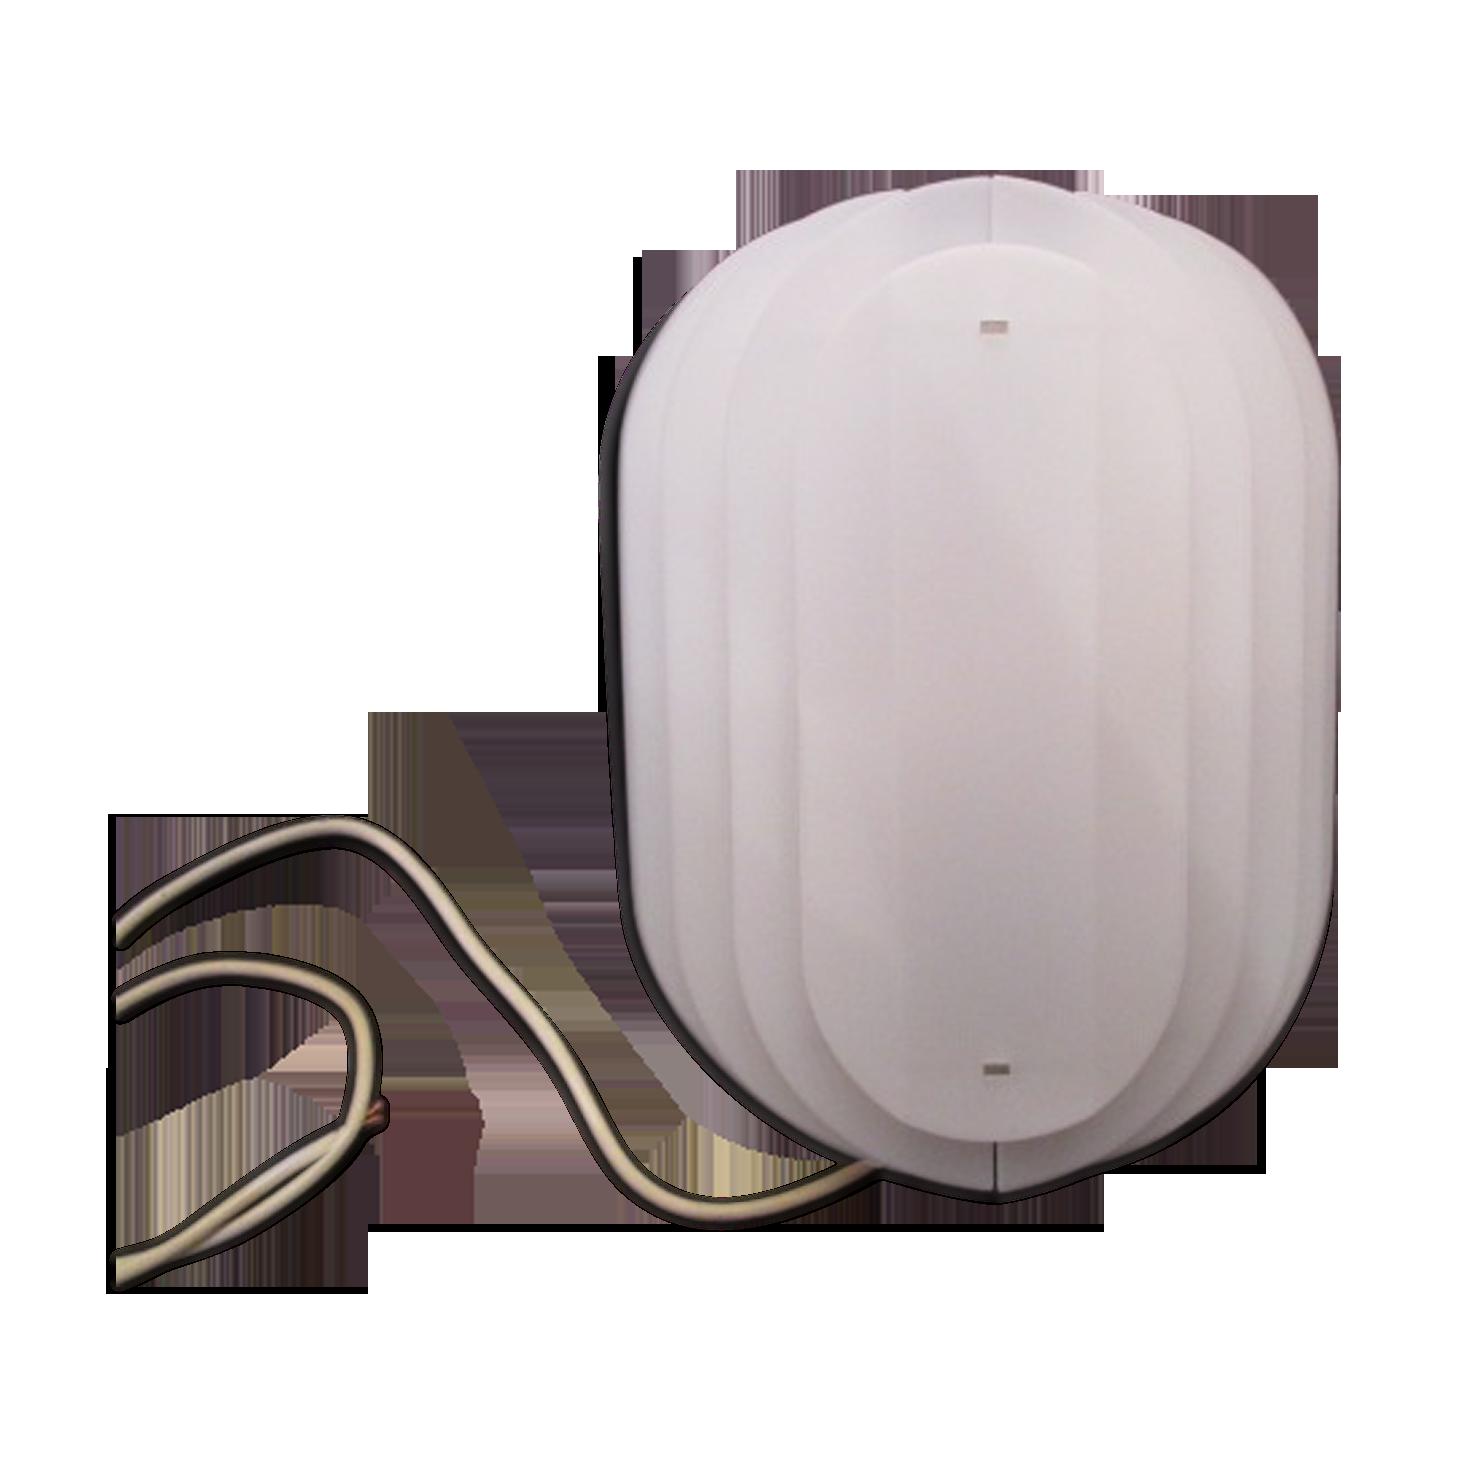 Applique mazda ovale années plastique blanc vintage dokfrfg